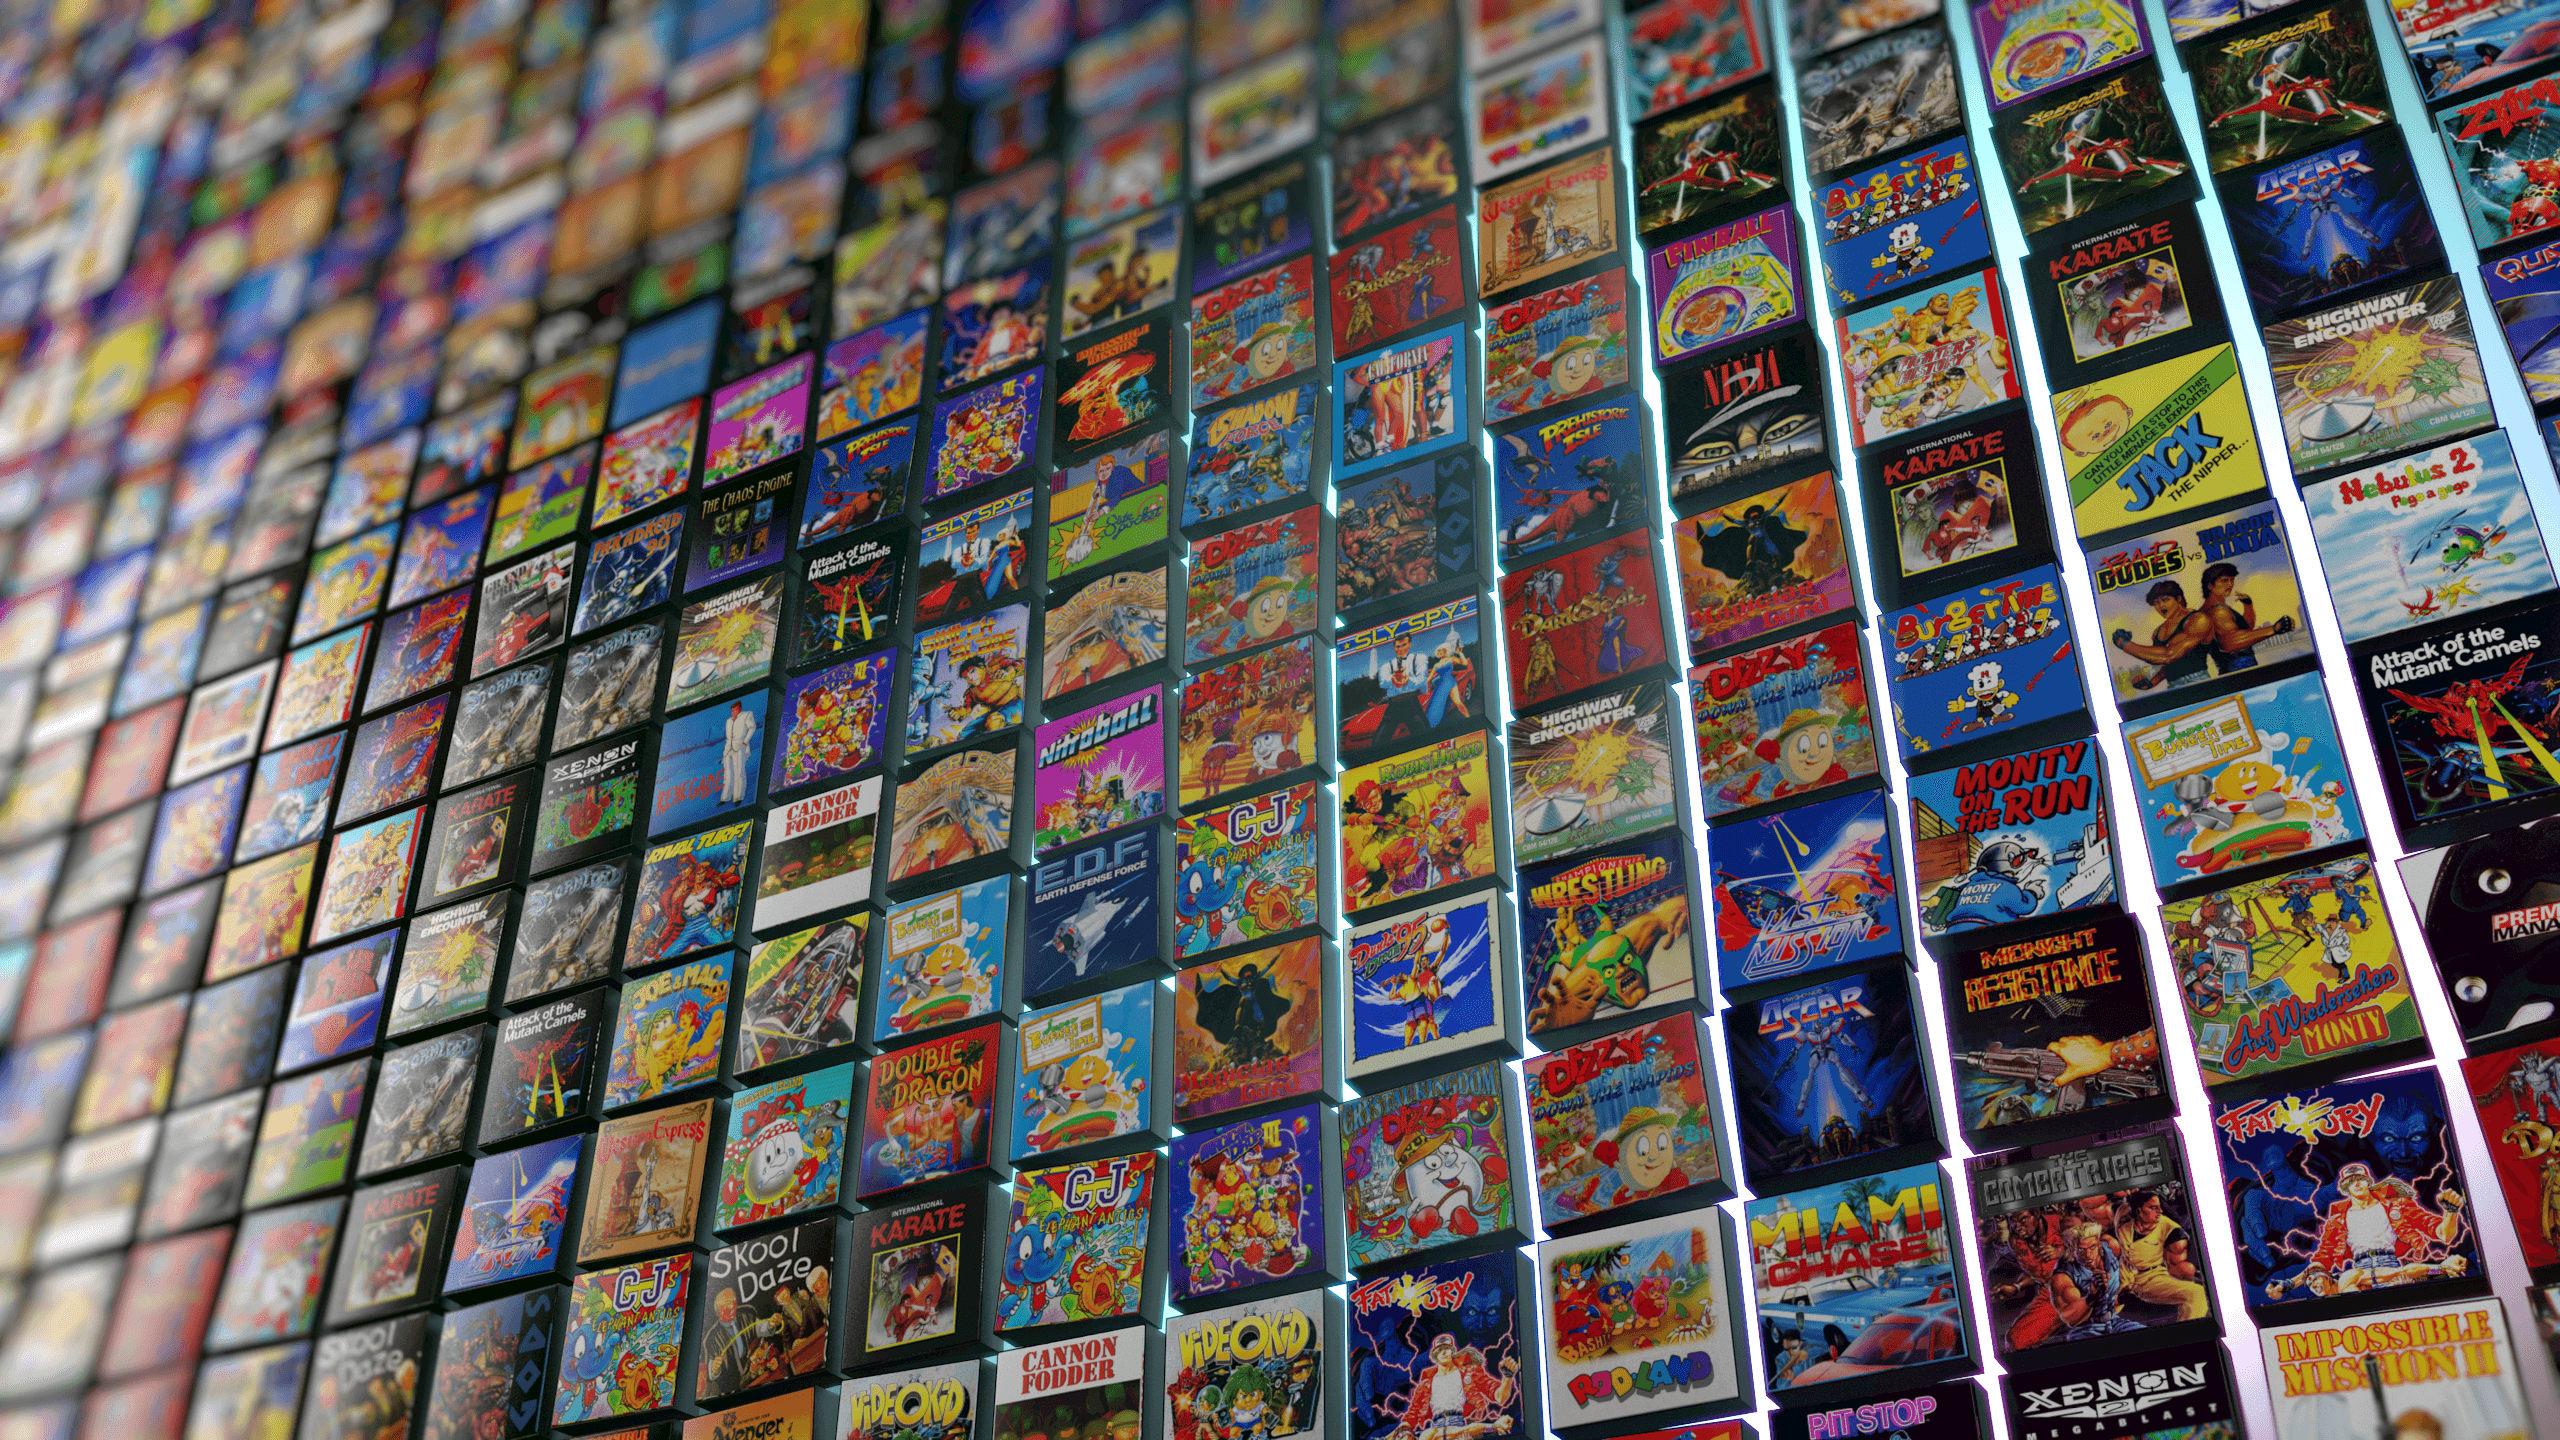 Retro Gaming Wallpaper 2560x1440 Download Hd Wallpaper Wallpapertip